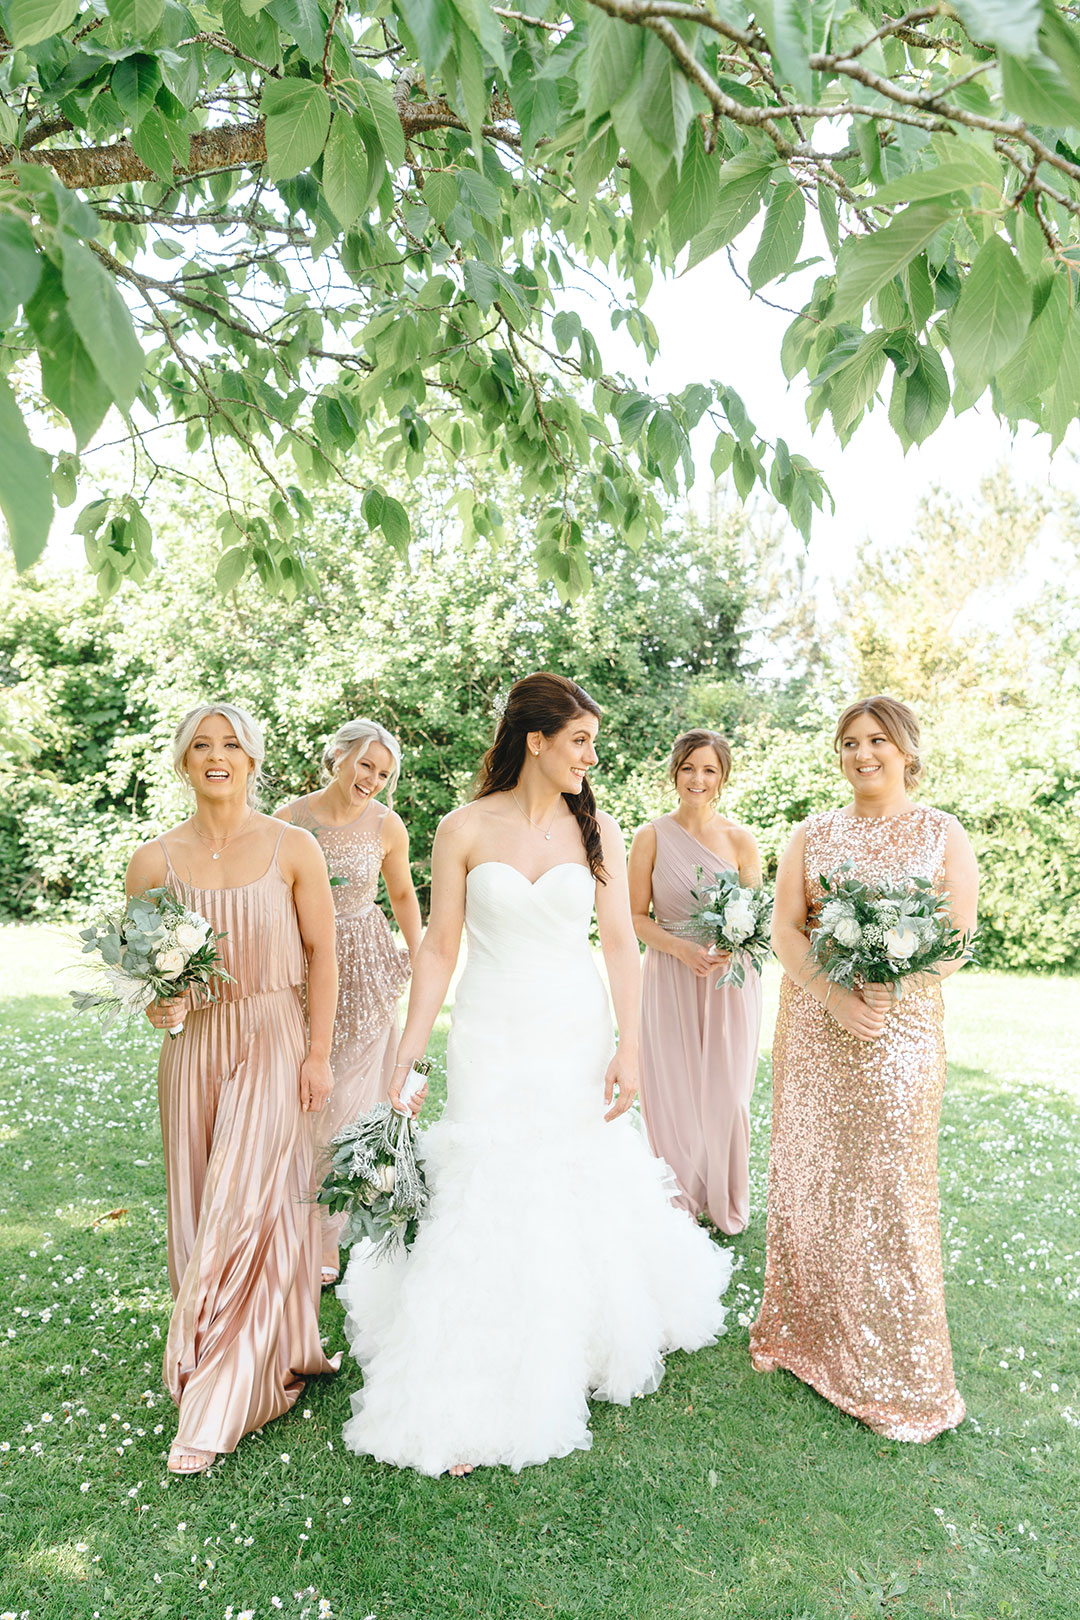 bellinter-house-wedding-photographer-0092_0092.jpg